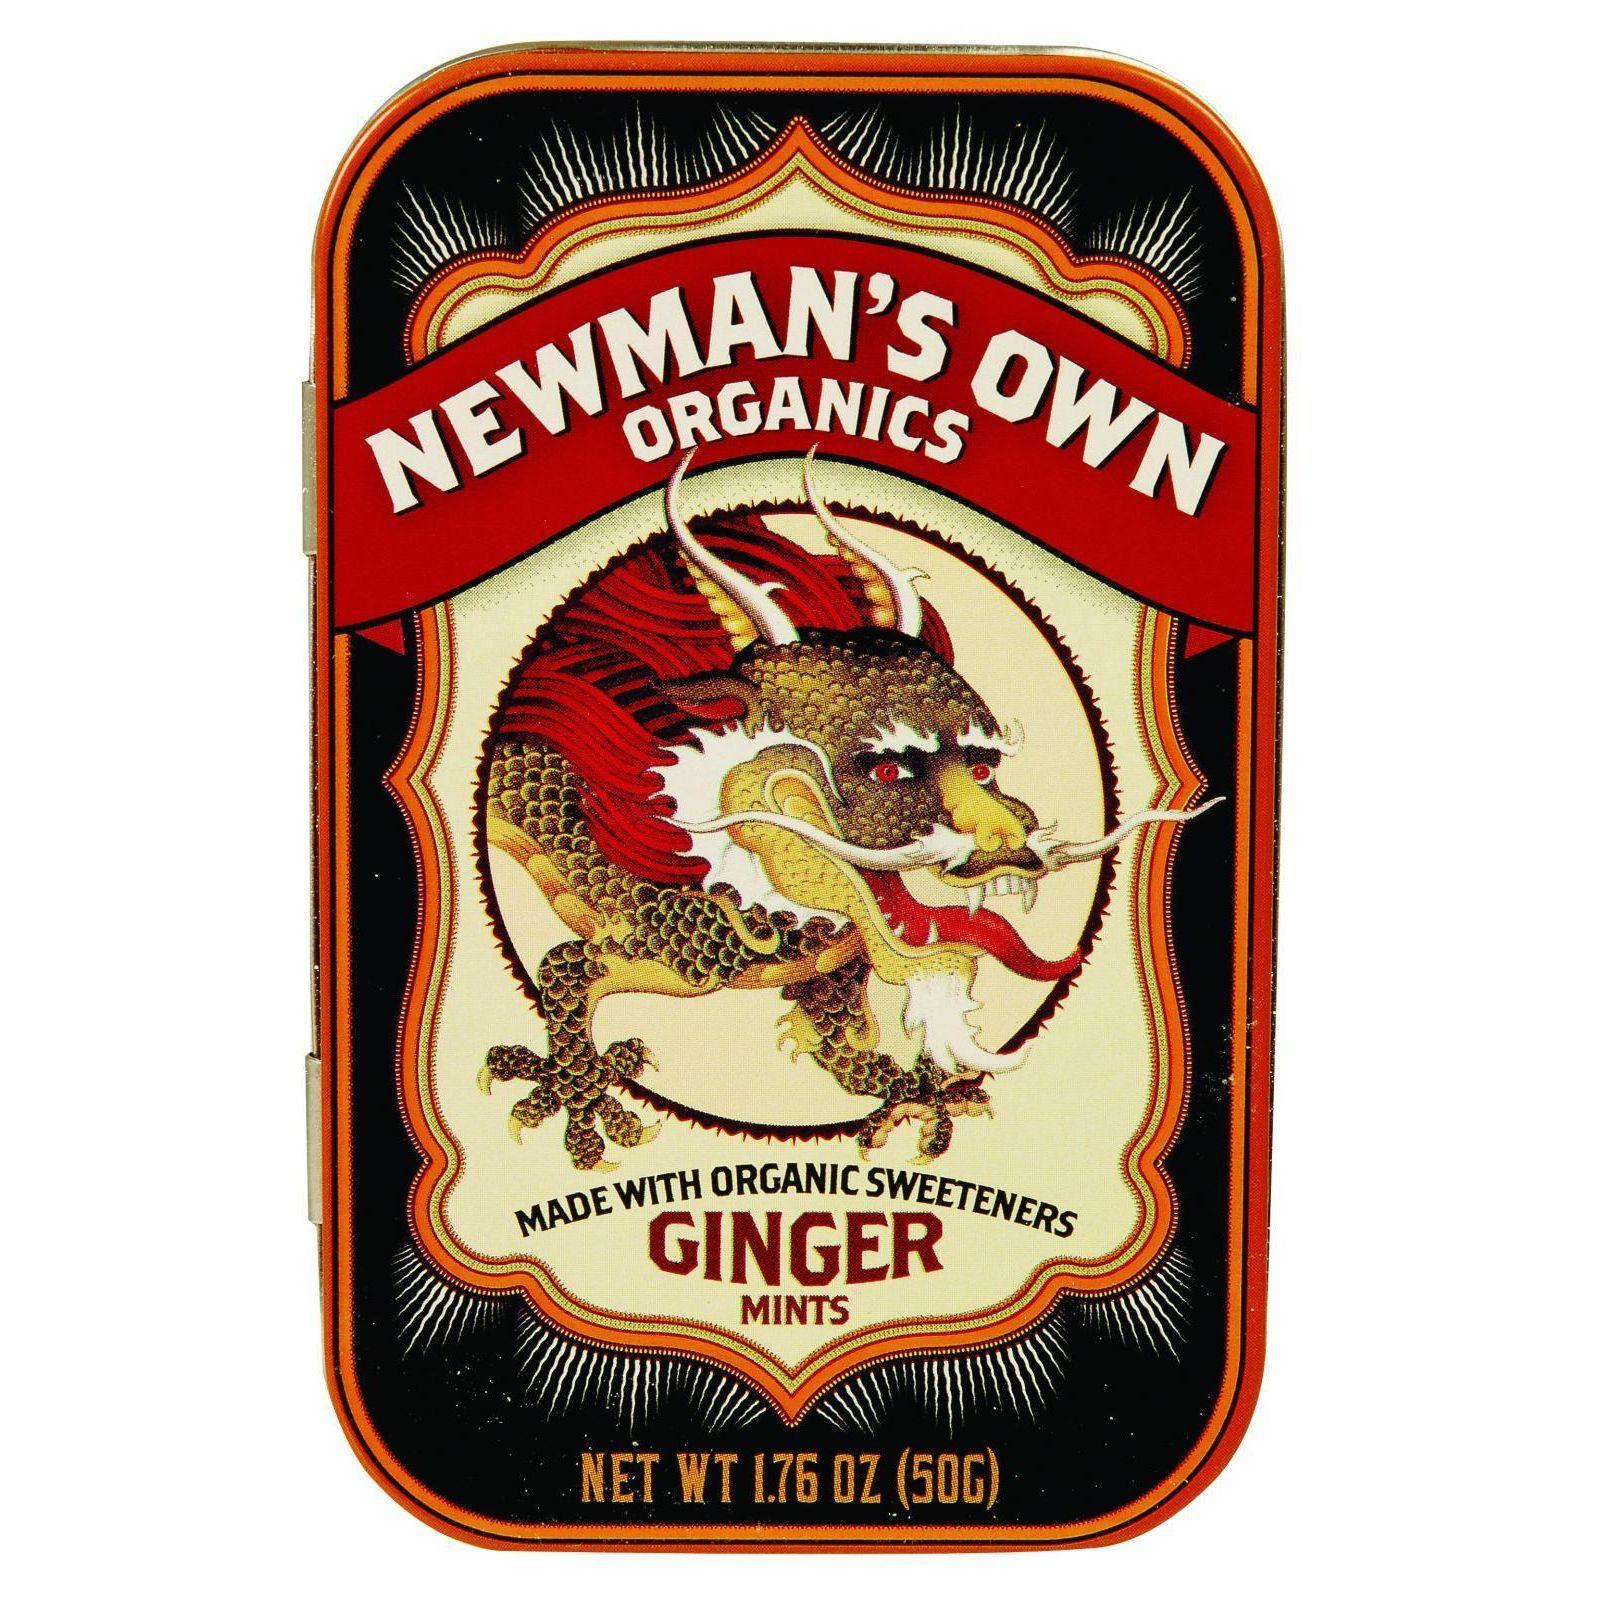 Newman's Own Organics Mints - Organic - Ginger - 1.65 oz - Case of 6